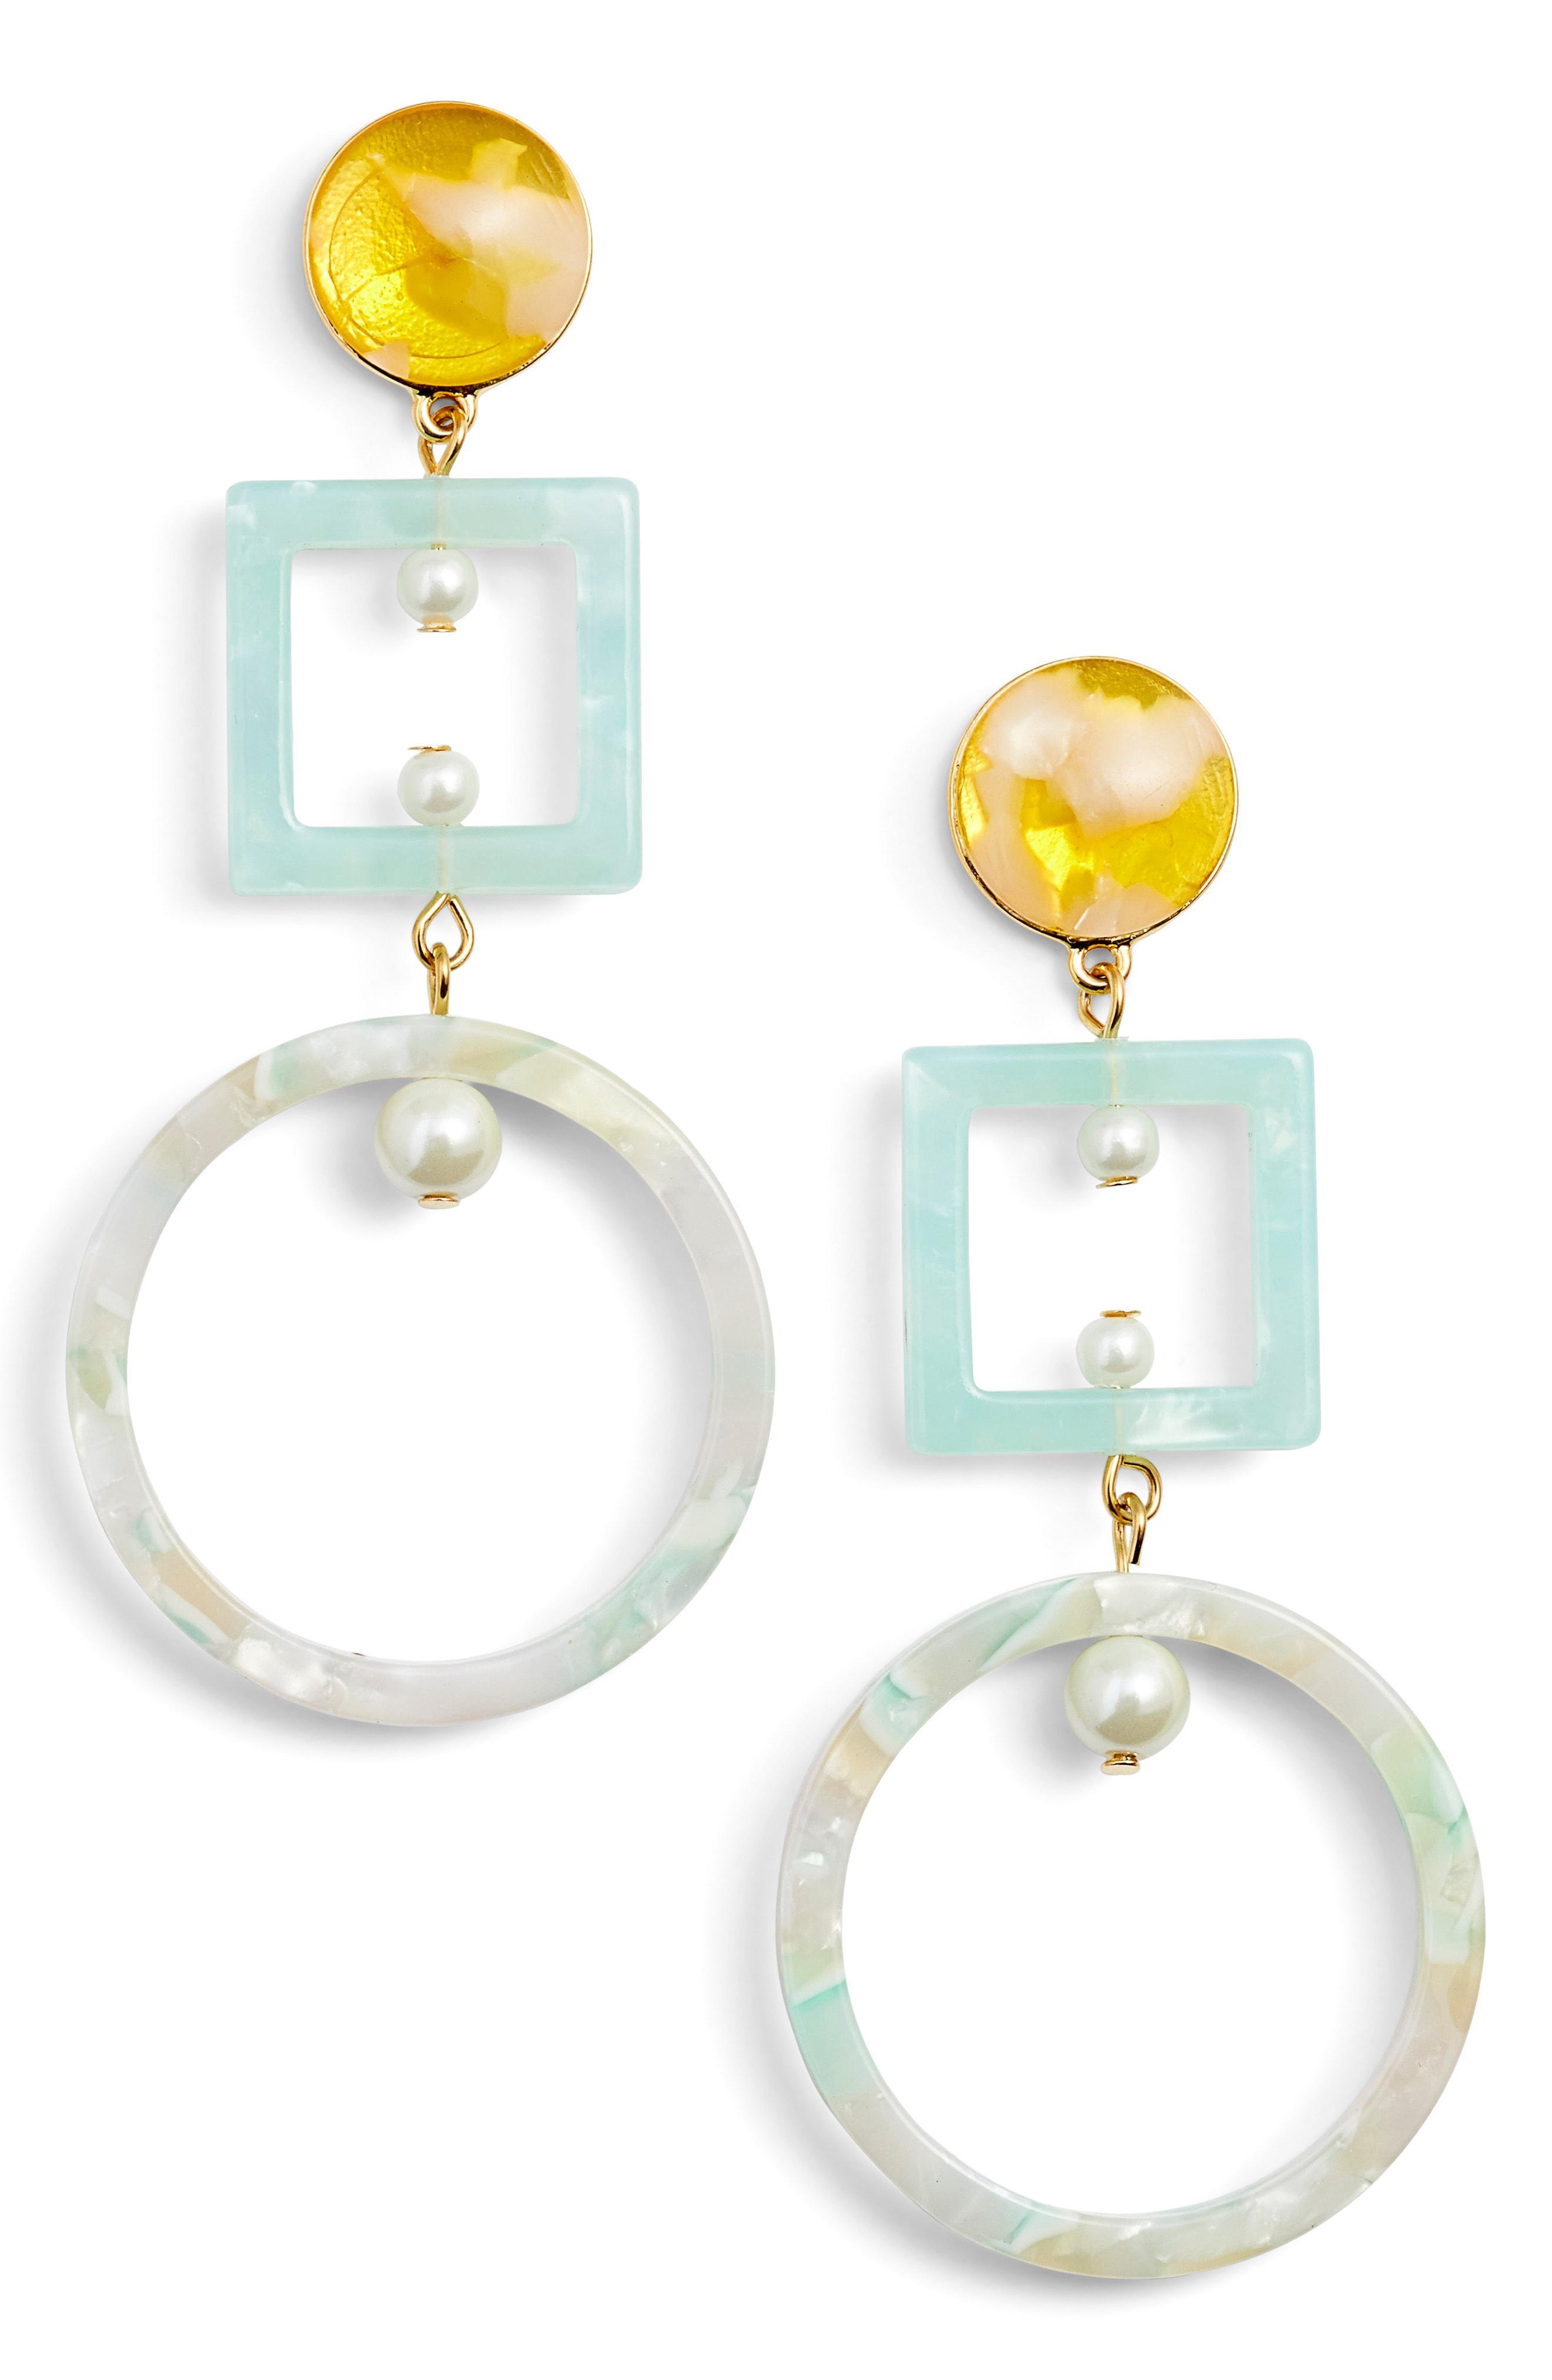 Lele Sadoughi Cage Imitation Pearl Drop Earrings